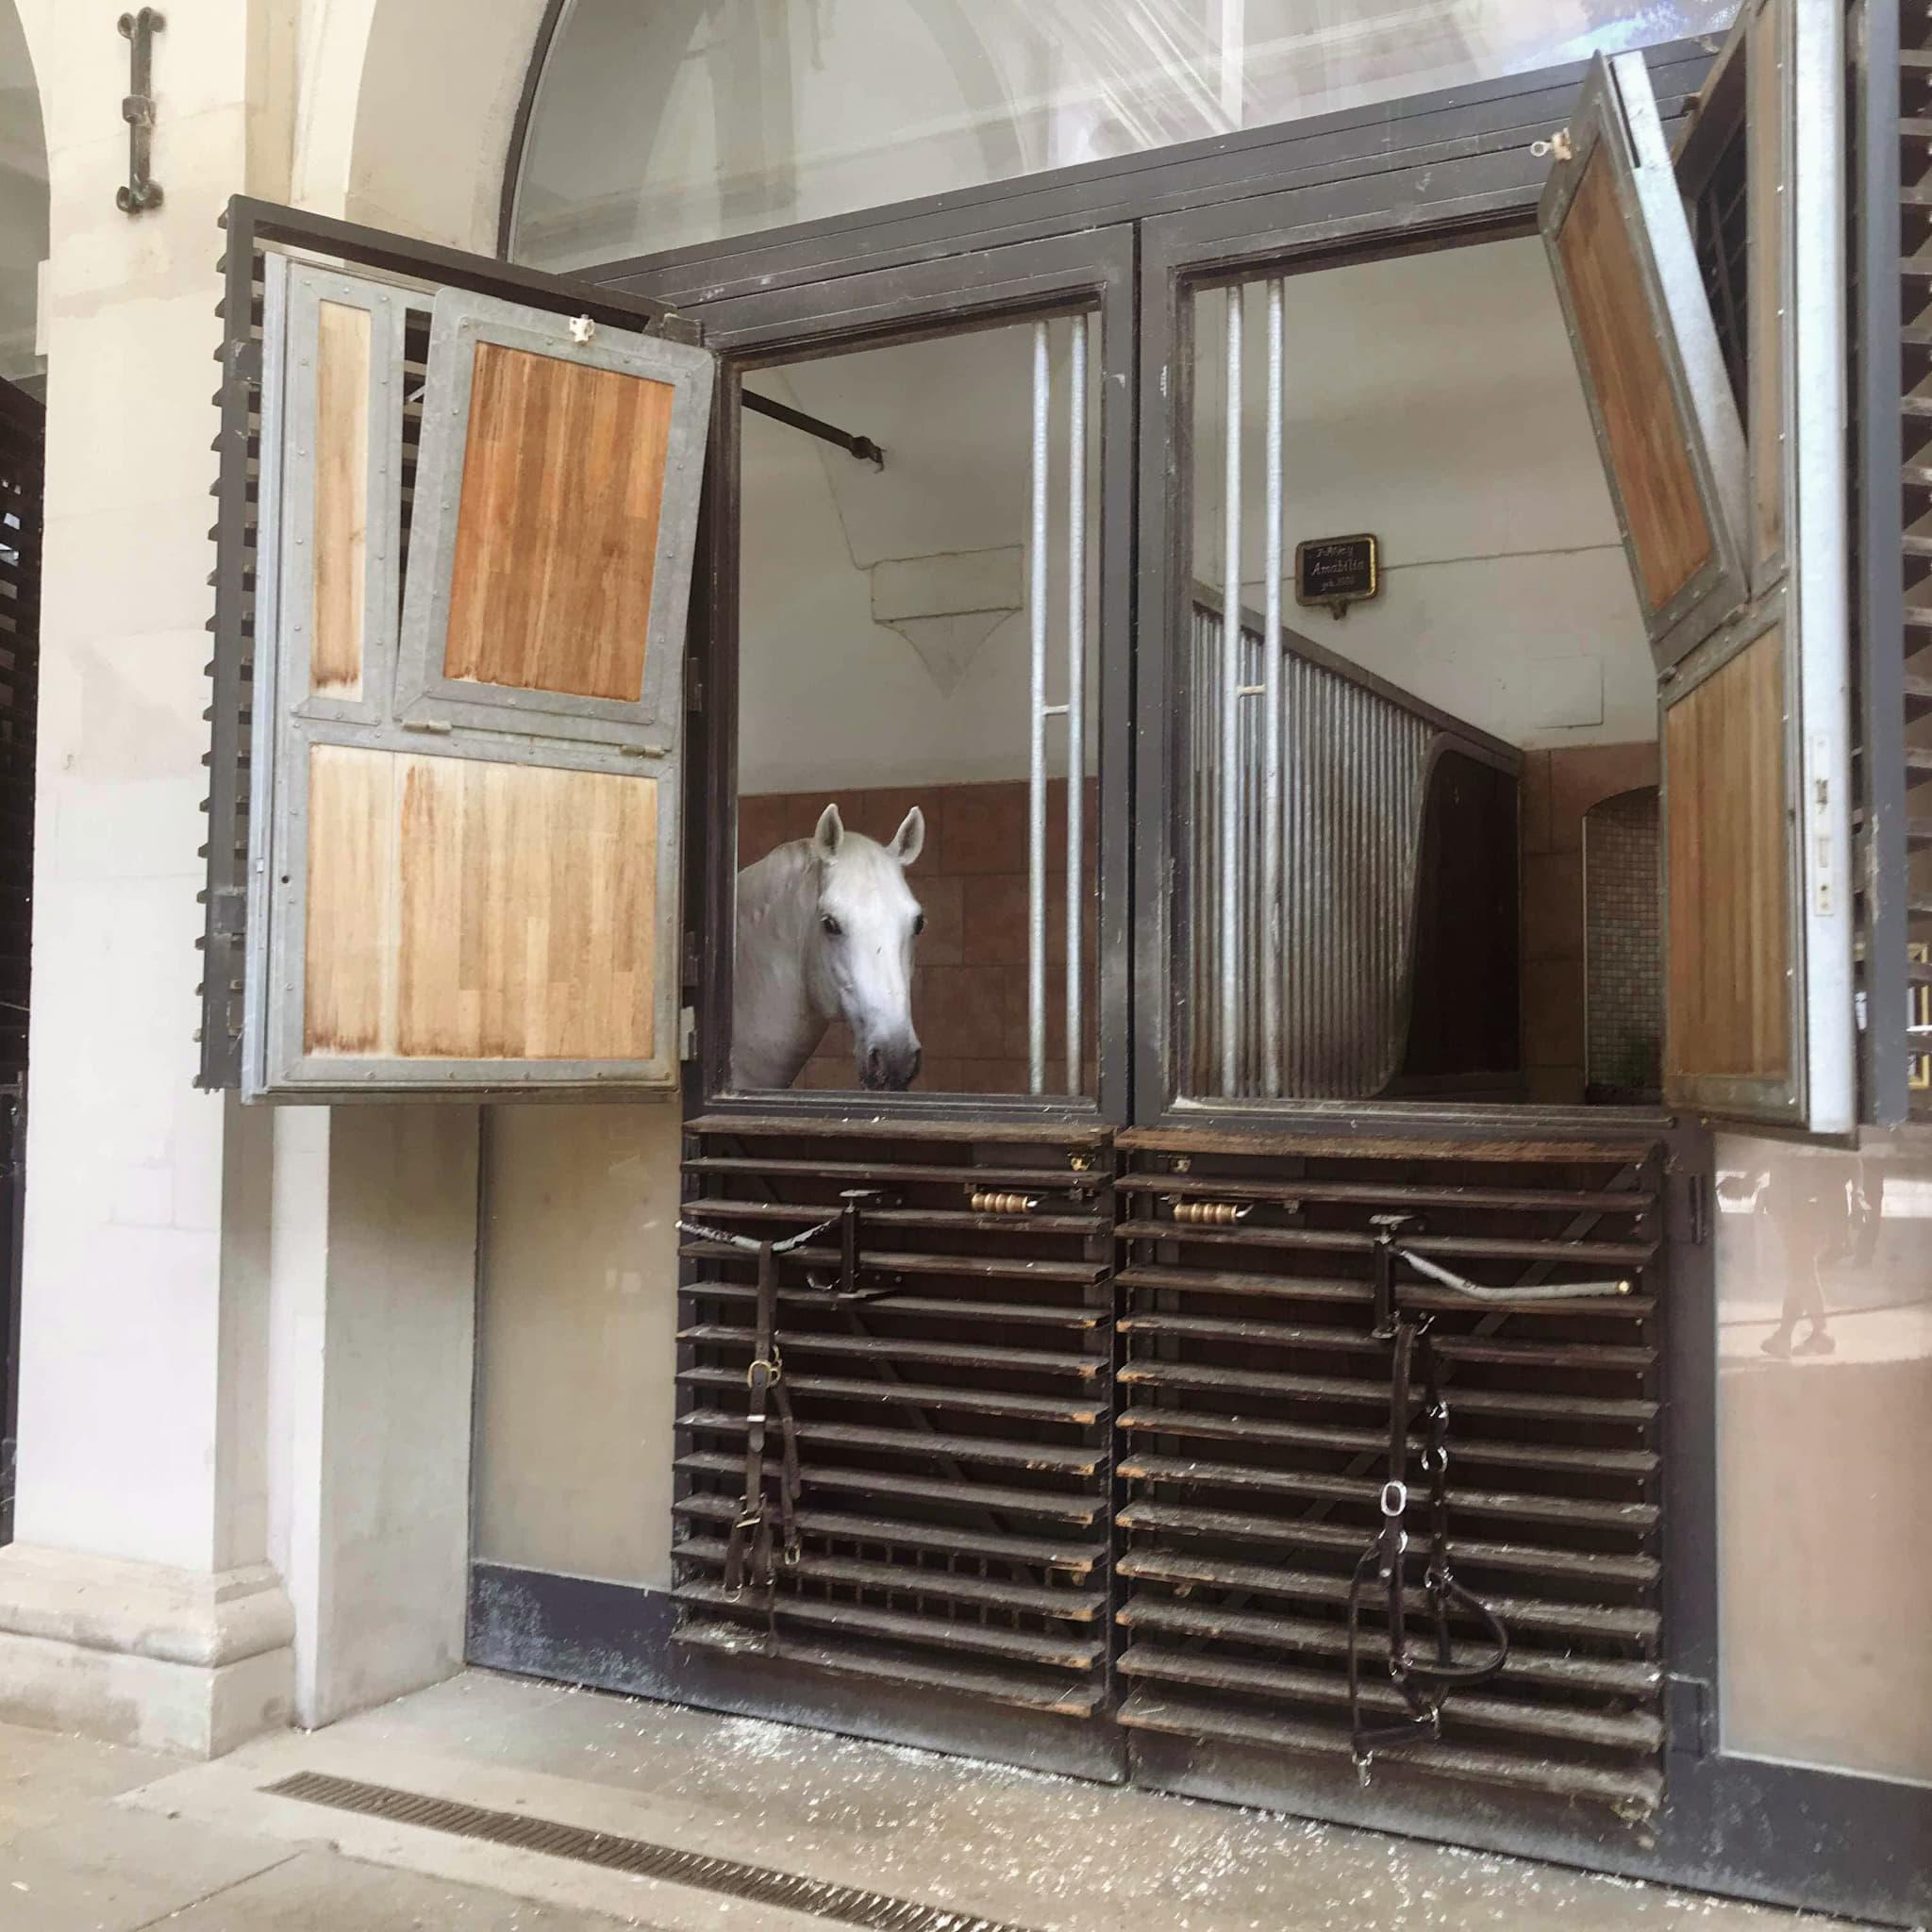 Spanish riding school stables